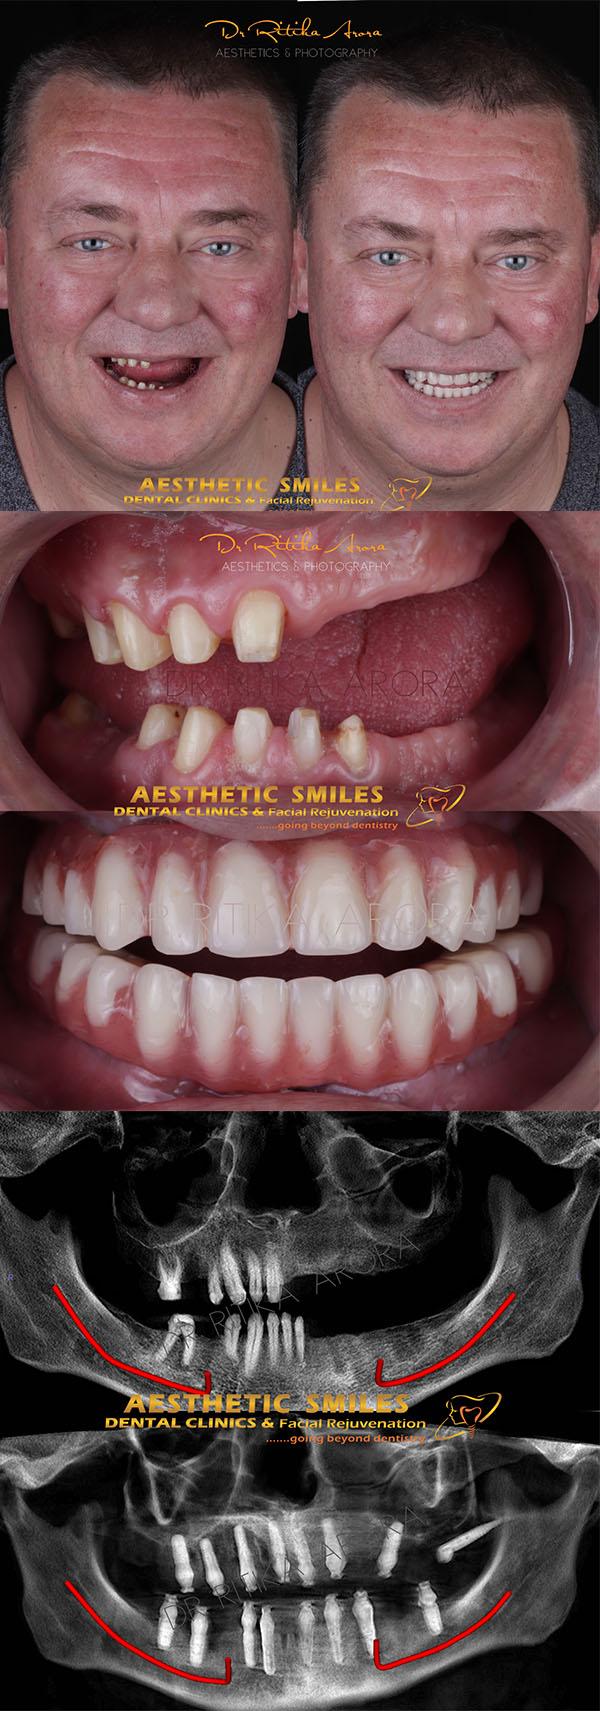 dental implants in mumbai case 4